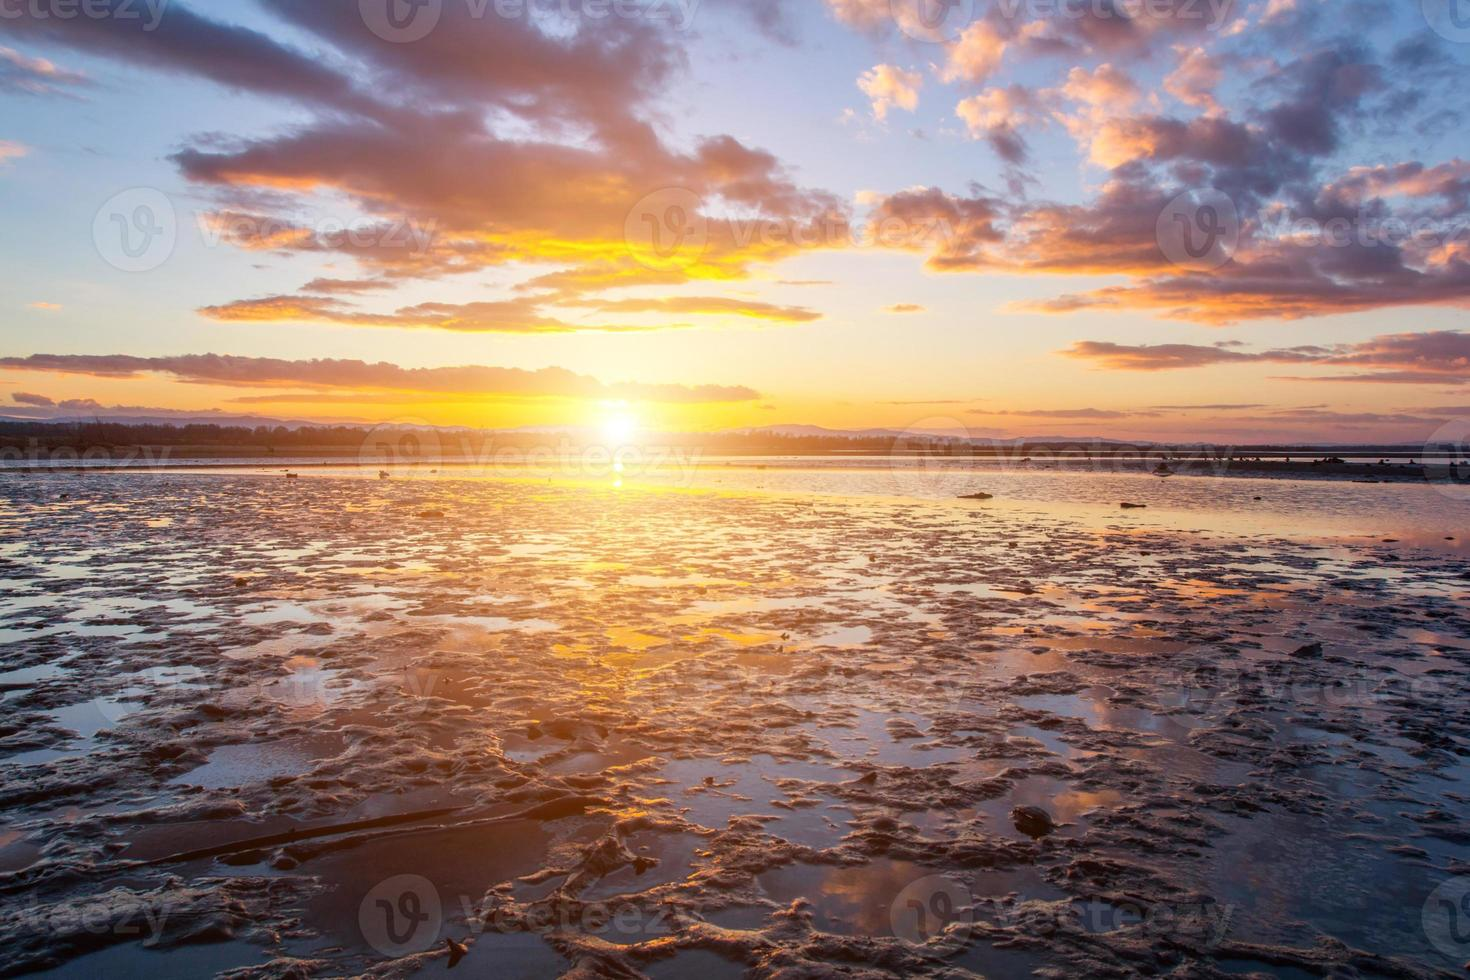 Sunset in winter photo